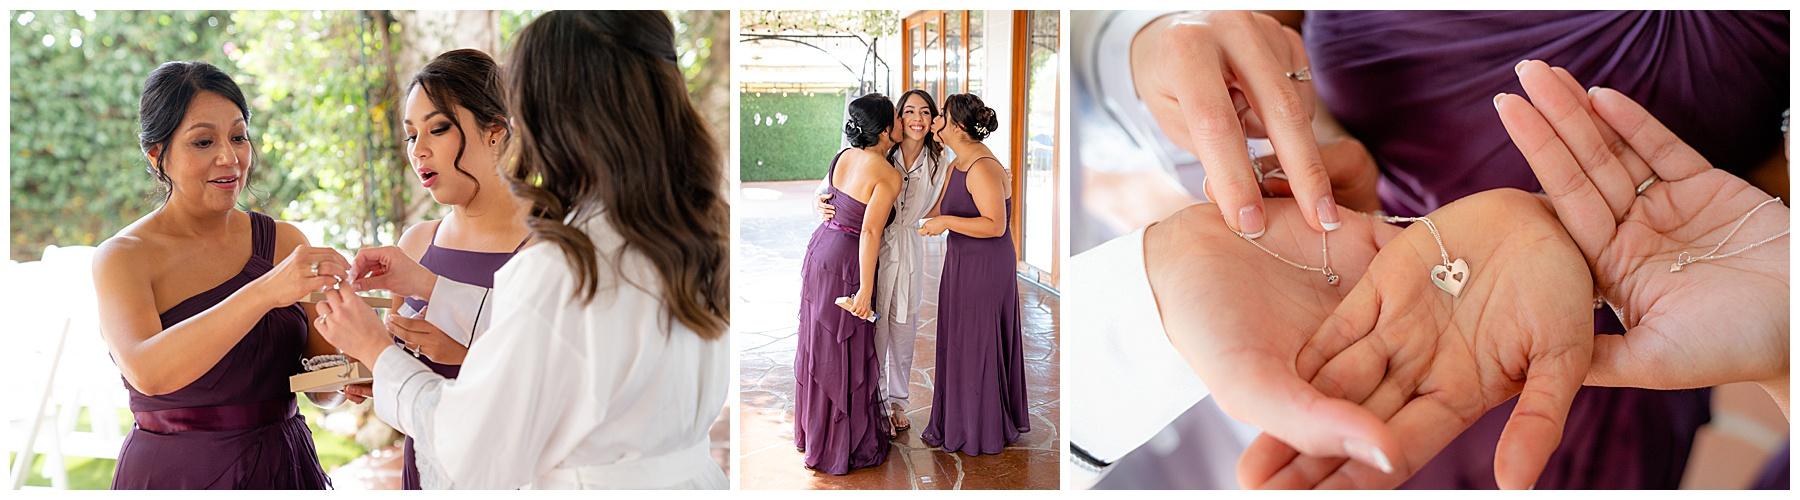 mom and sister gift to bride calamigos equestrian center wedding